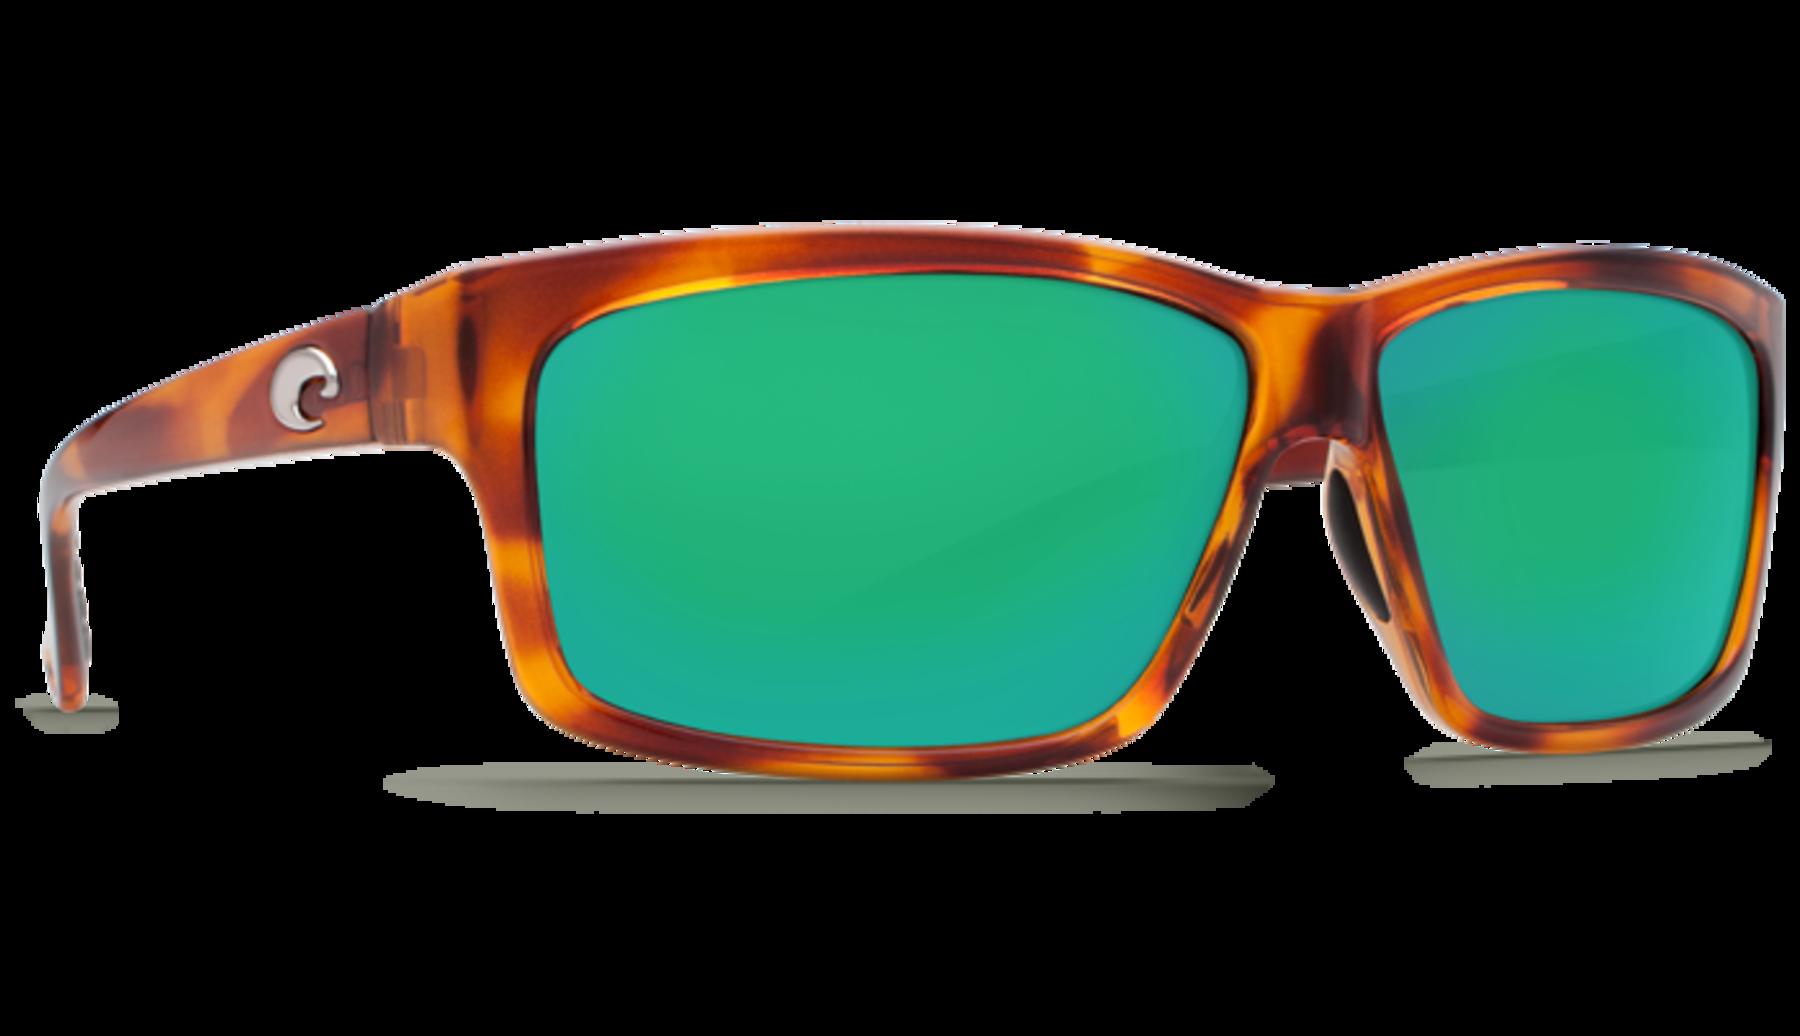 Best fishing sunglasses for 2015 2016 hatch magazine for Costa fishing glasses